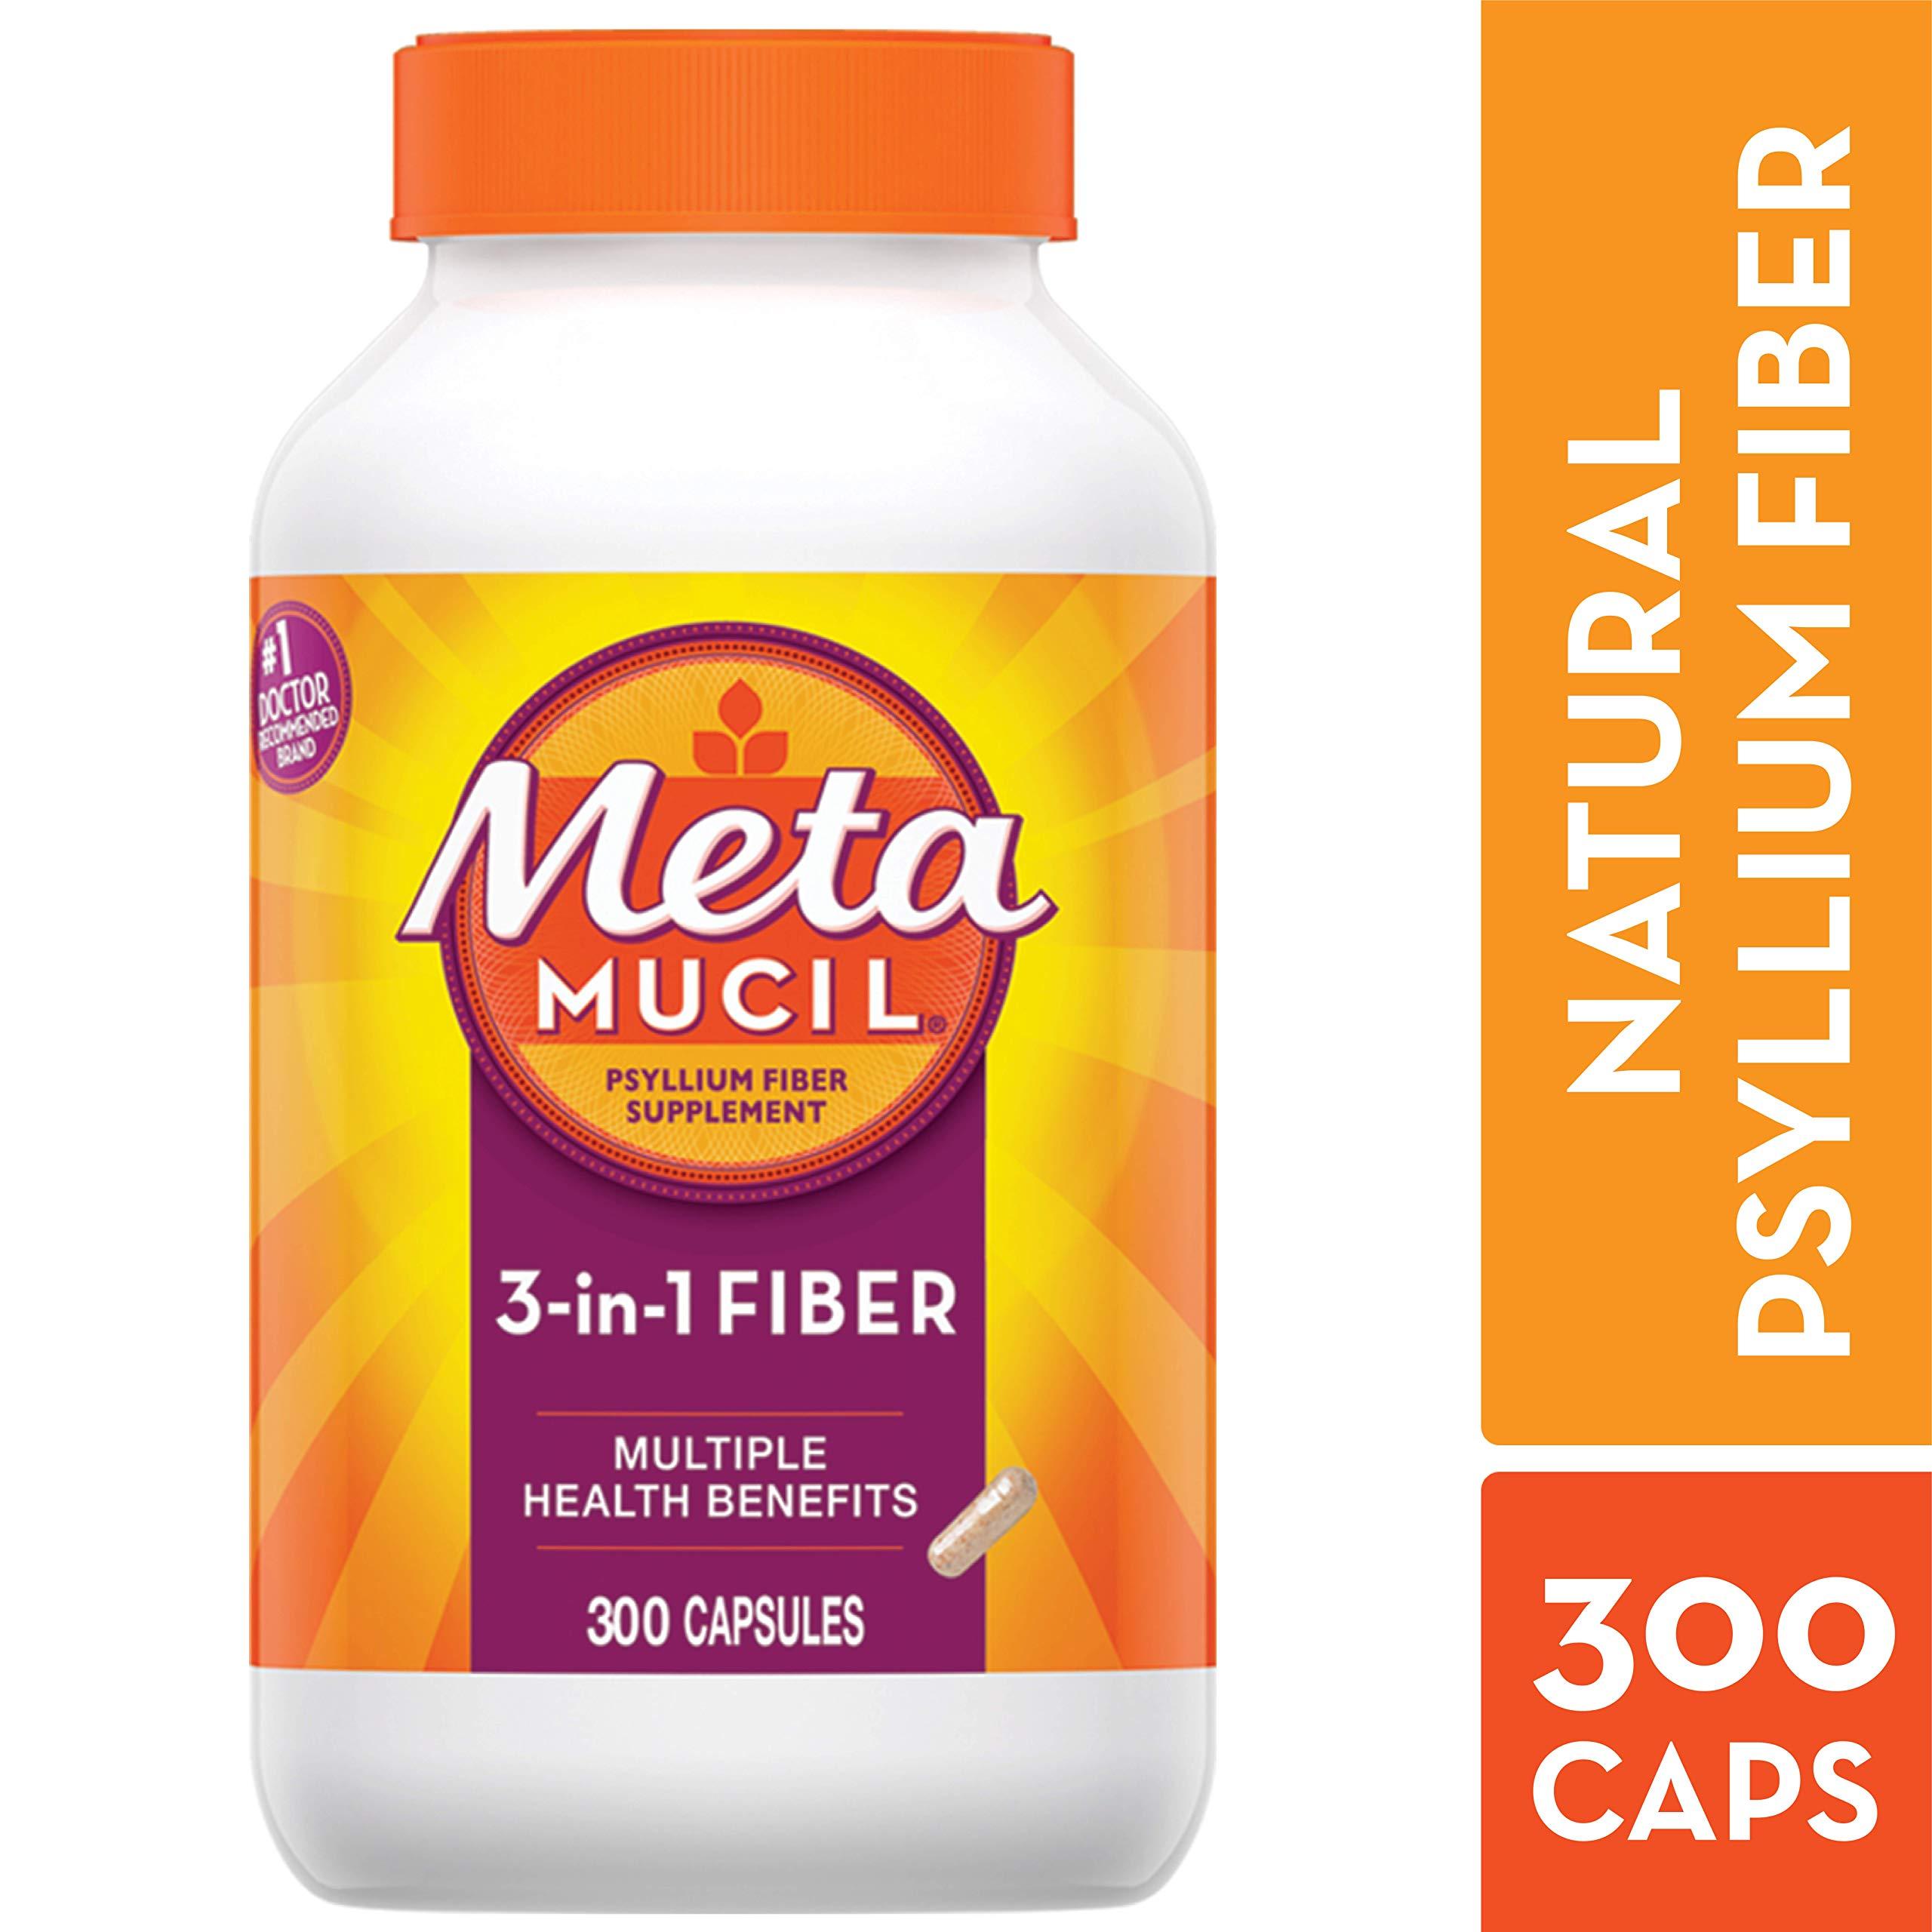 Metamucil Fiber, 3-in-1 Psyllium Capsule Fiber Supplement, 300 ct Capsules by Metamucil